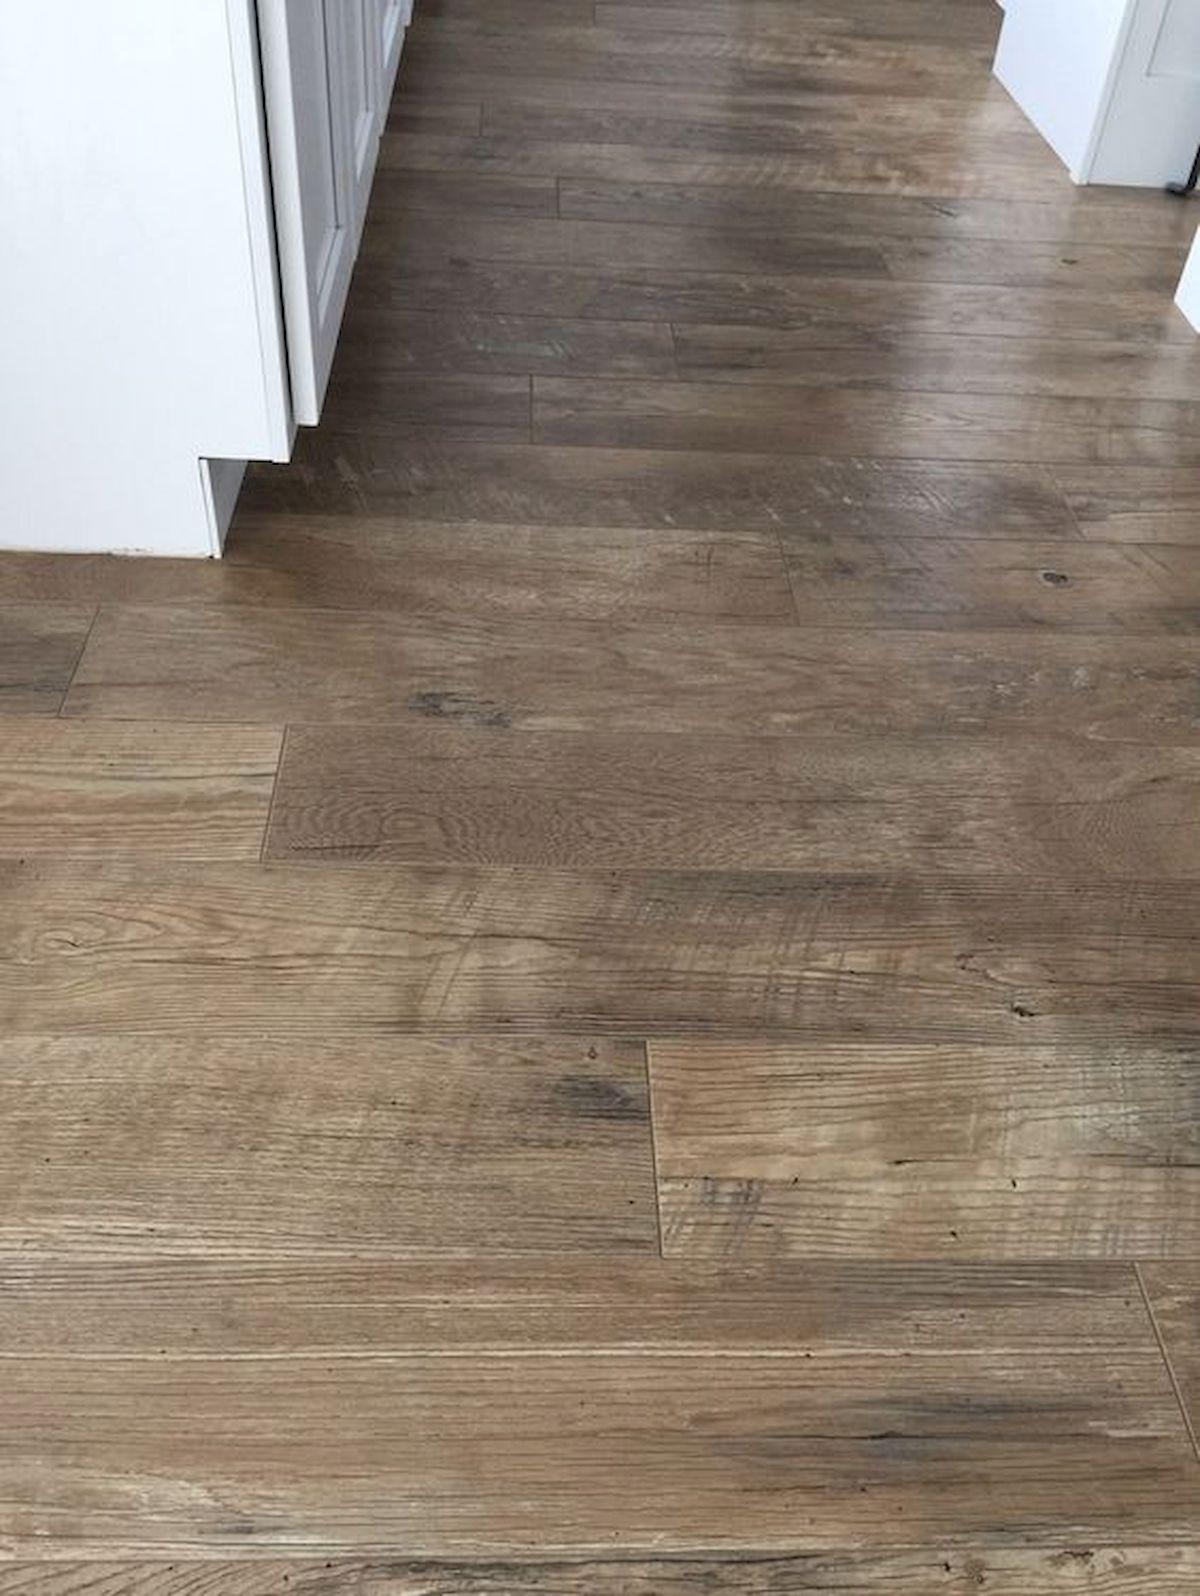 80 Gorgeous Hardwood Floor Ideas for Interior Home (17)